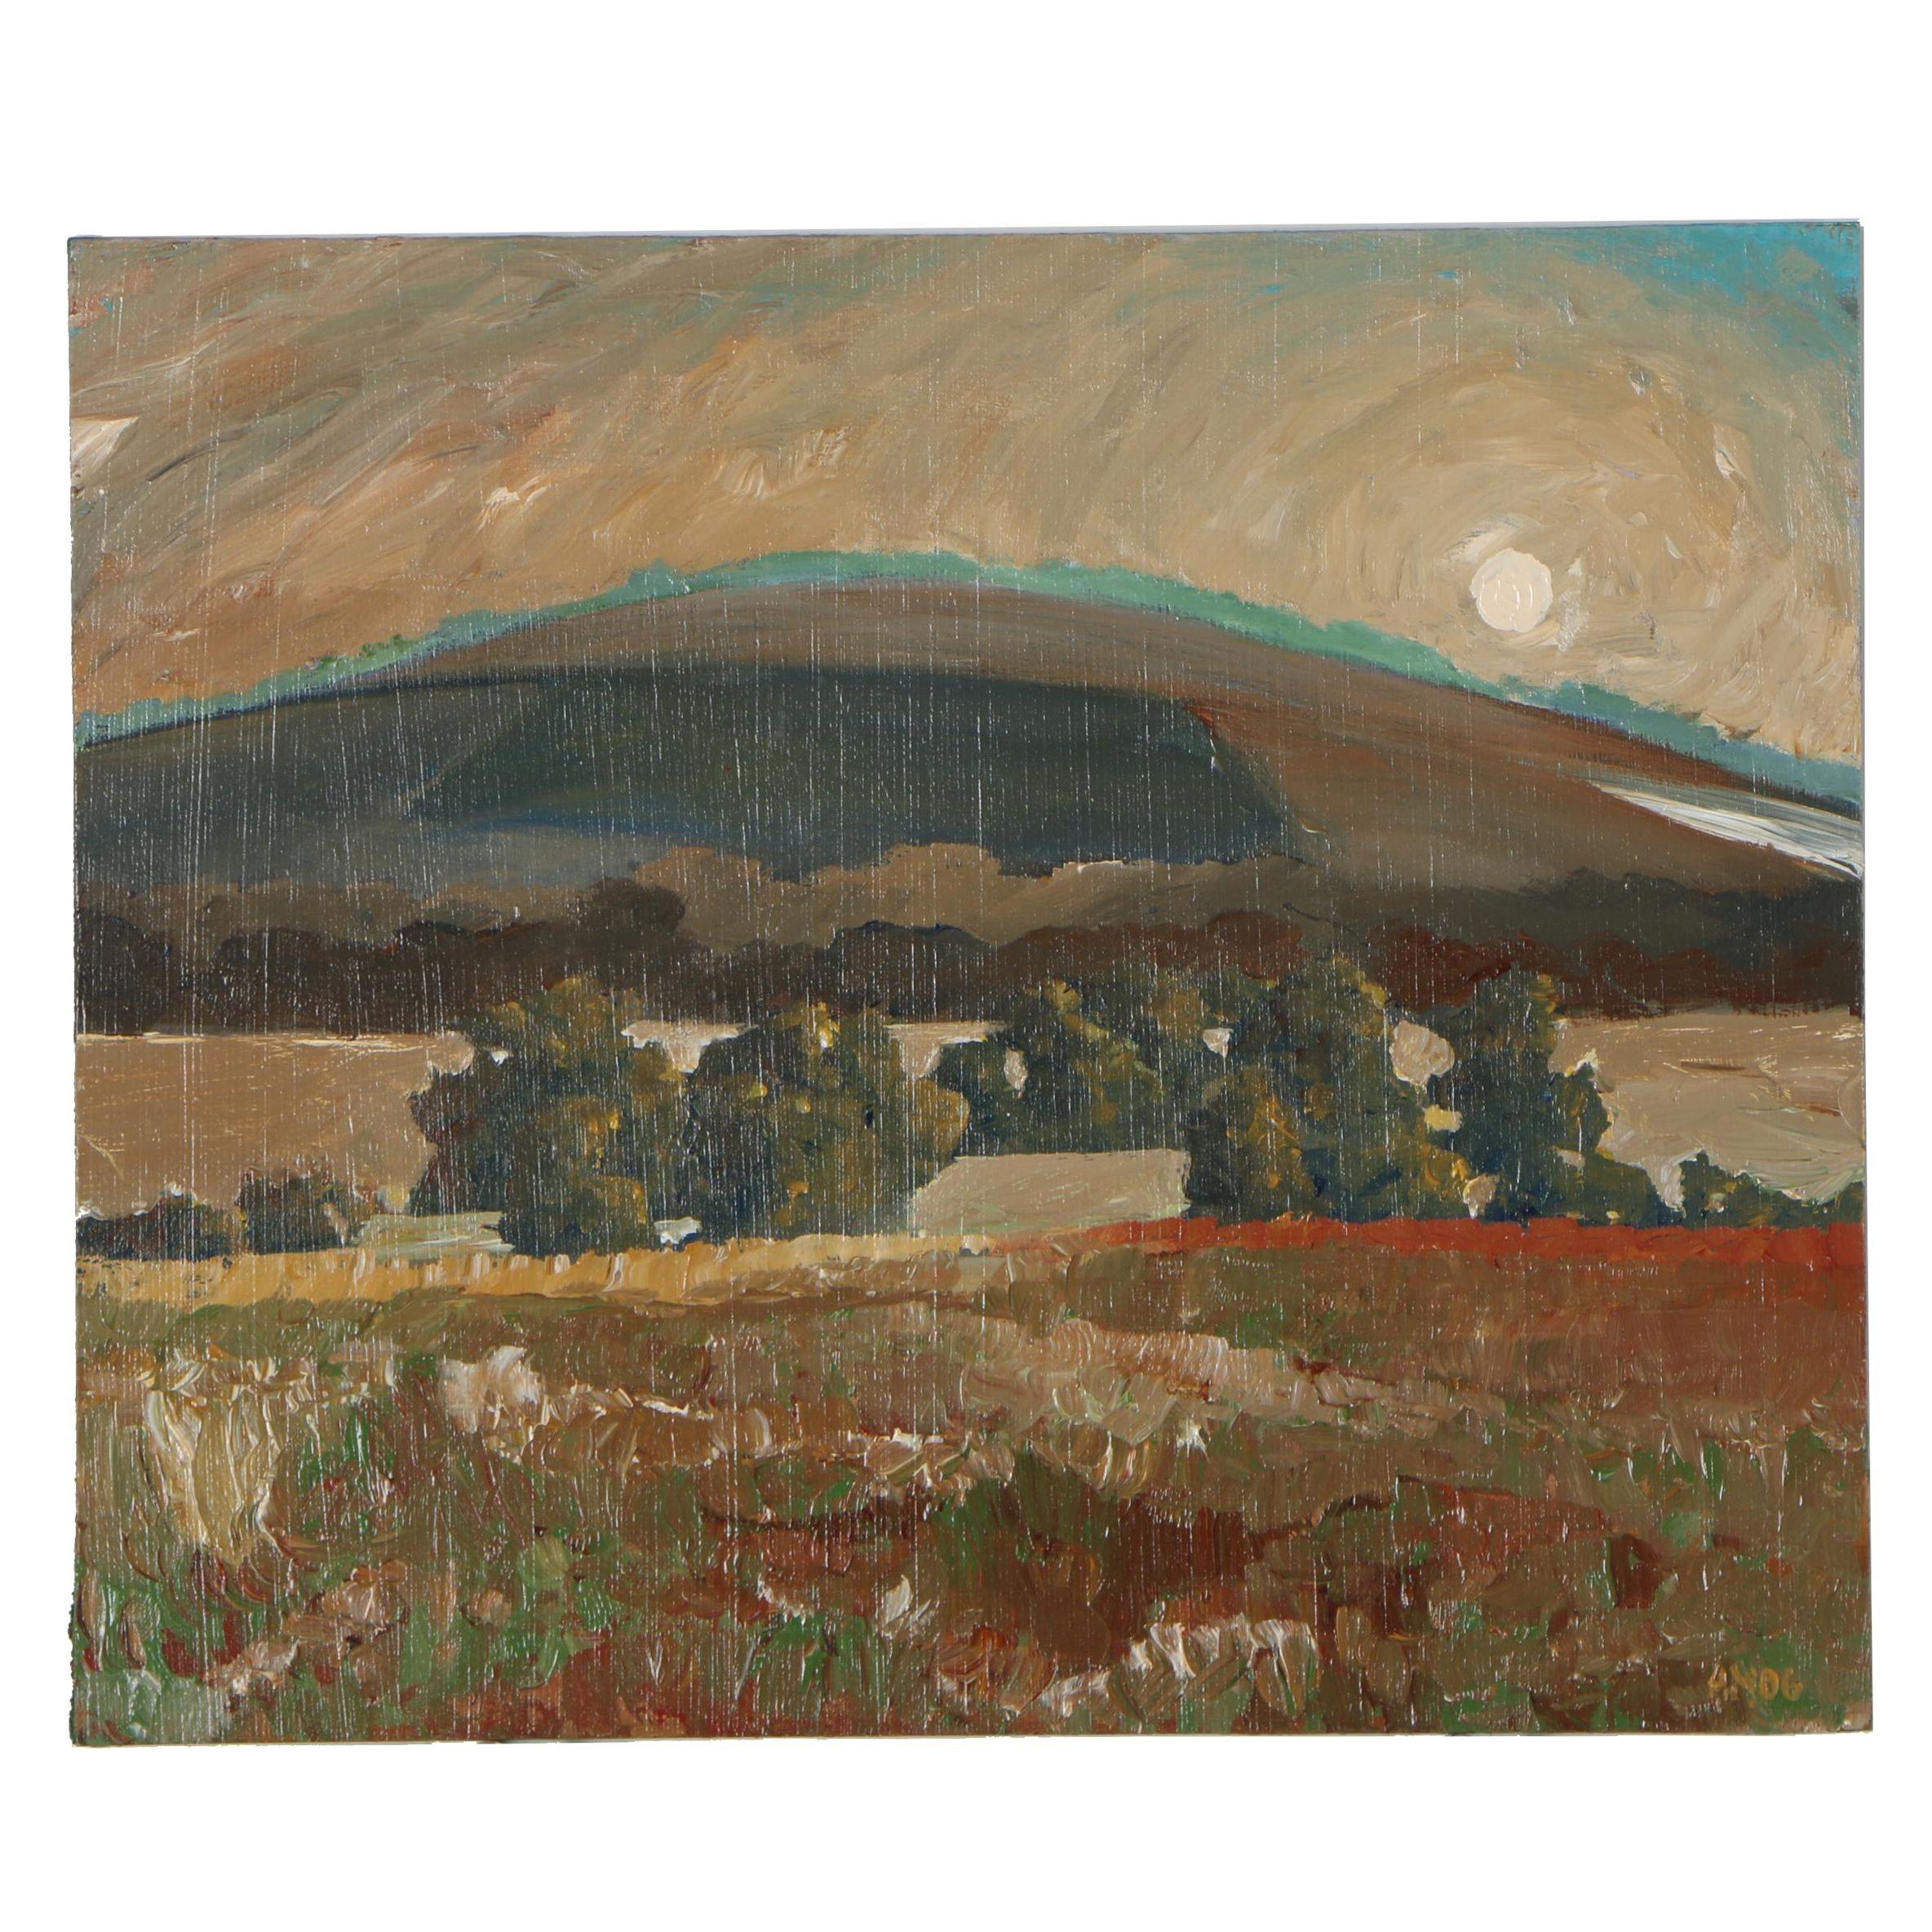 Adam Maeroff Landscape Oil Painting, 2006